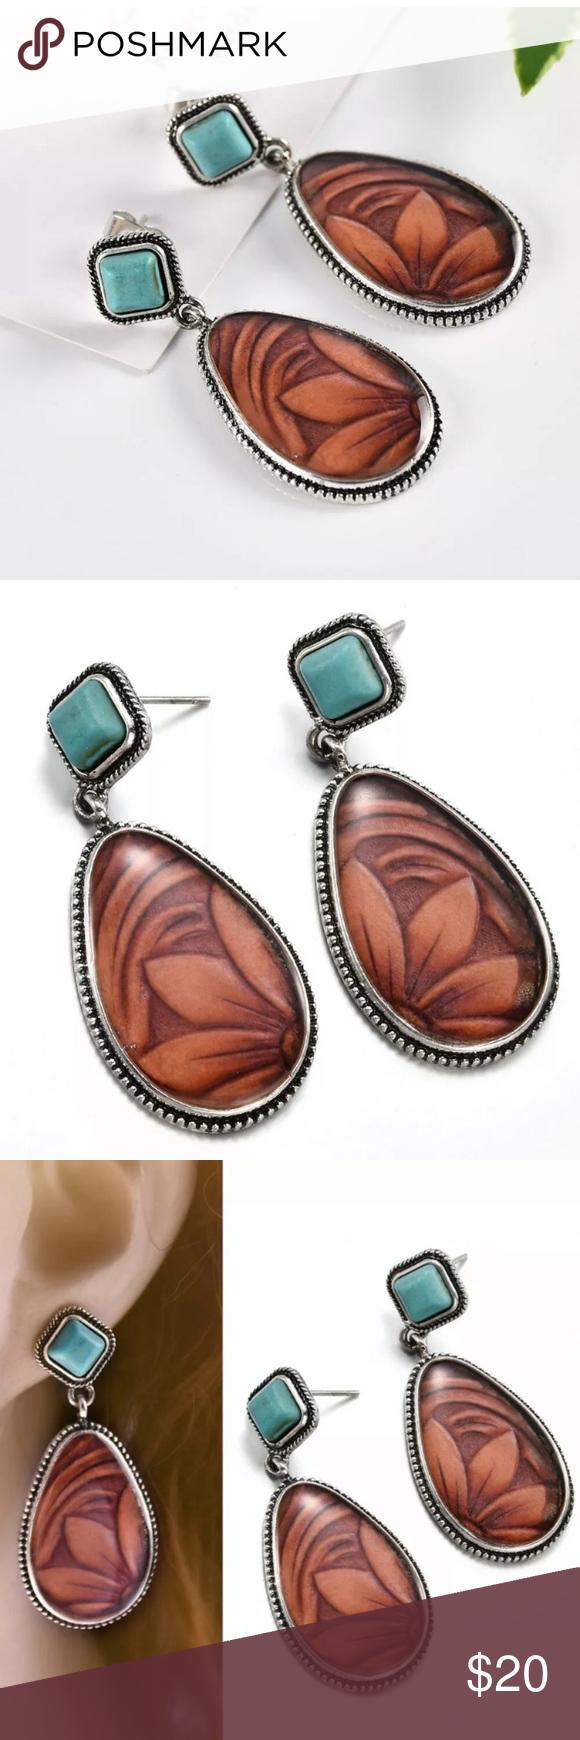 Photo of Boho / Southwestern turquoise Earrings Beautiful dangle earrings featuring faux …